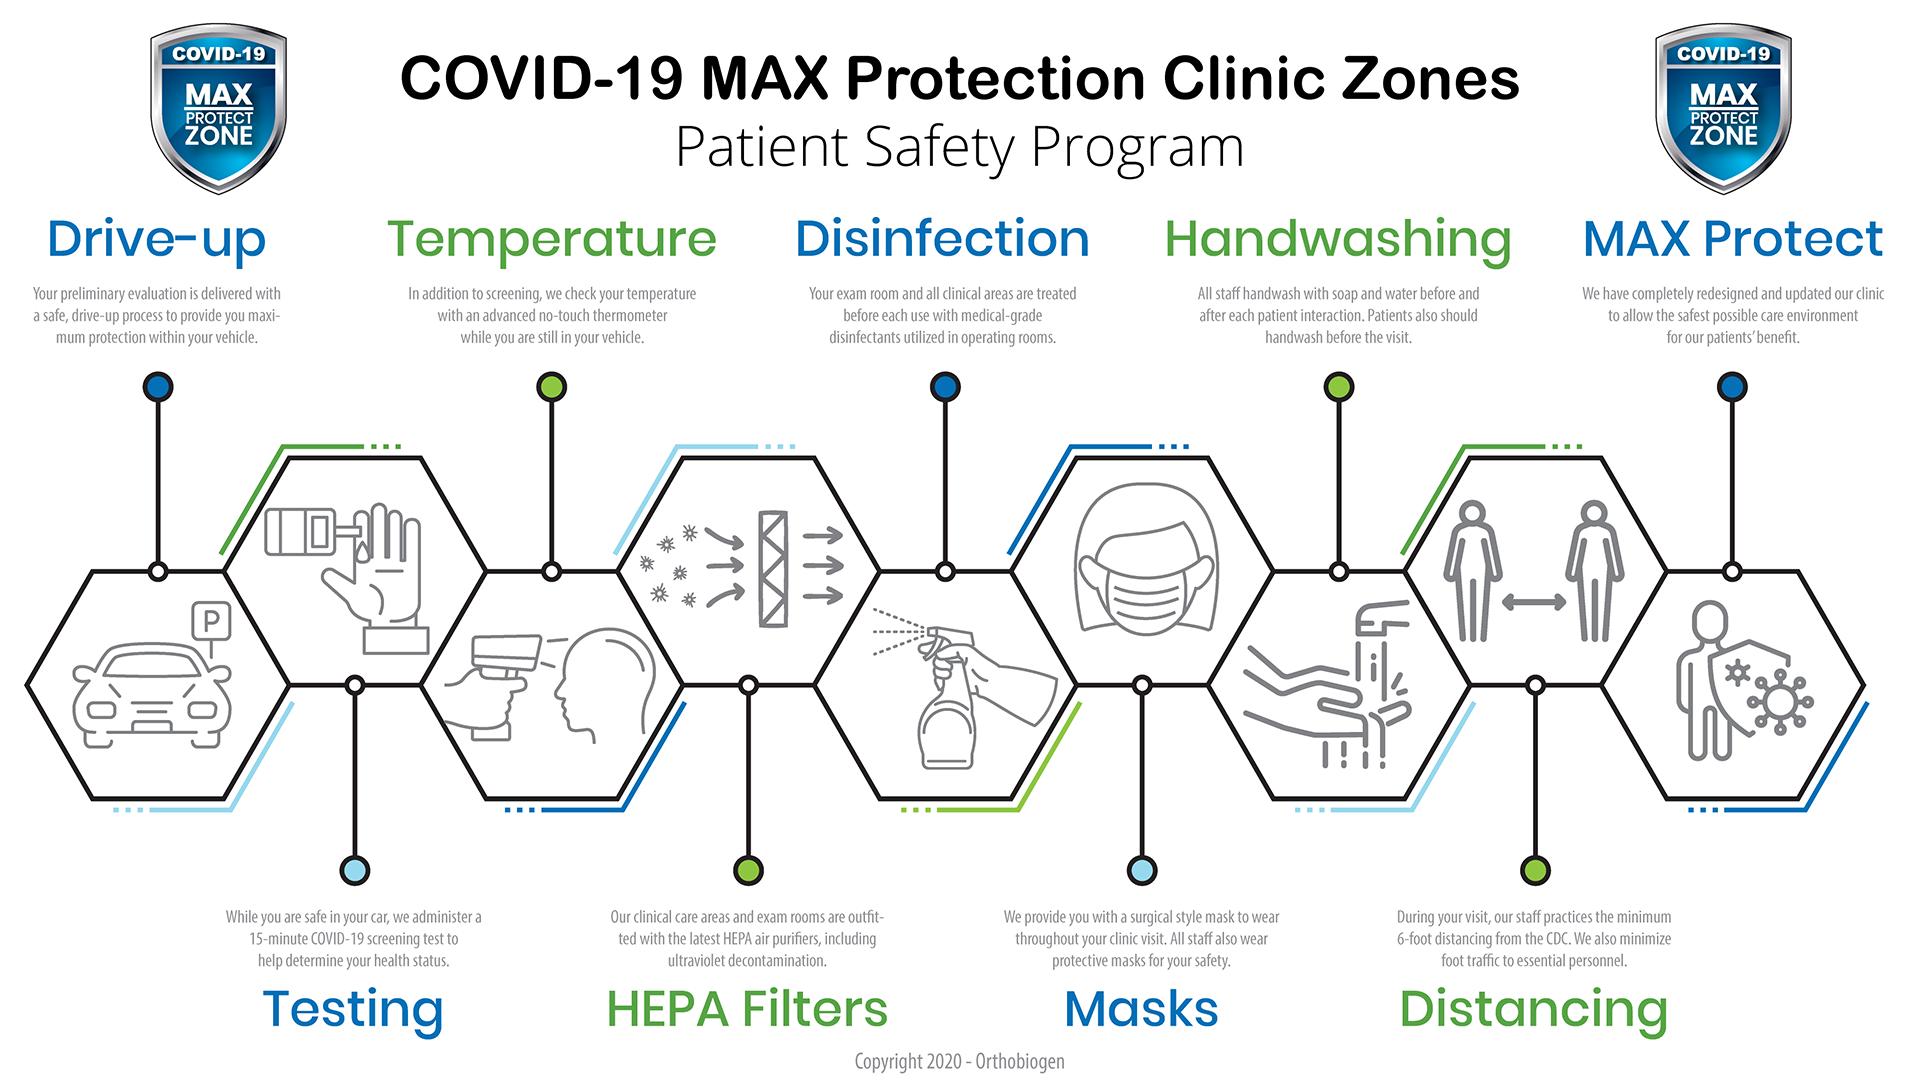 COVID-19 Maximum Protection Clinic Zone Process